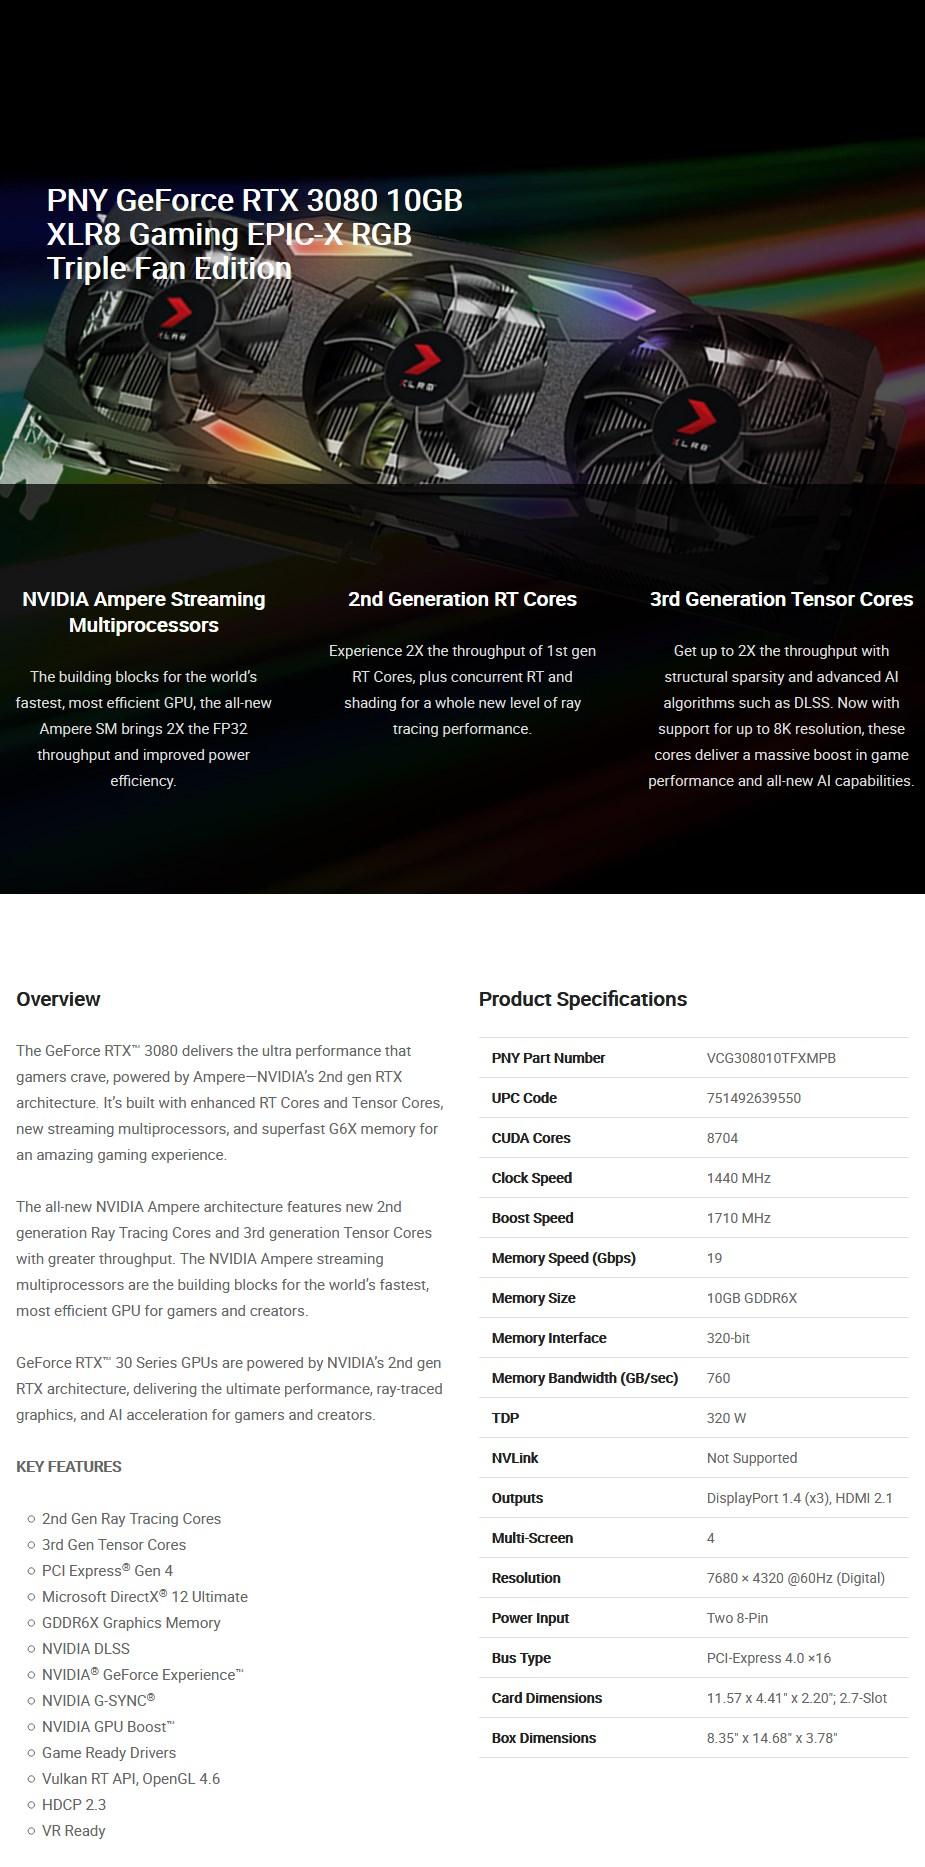 PNY GeForce RTX 3080 XLR8 Gaming EPIC-X RGB 10GB Video Card - Overview 1